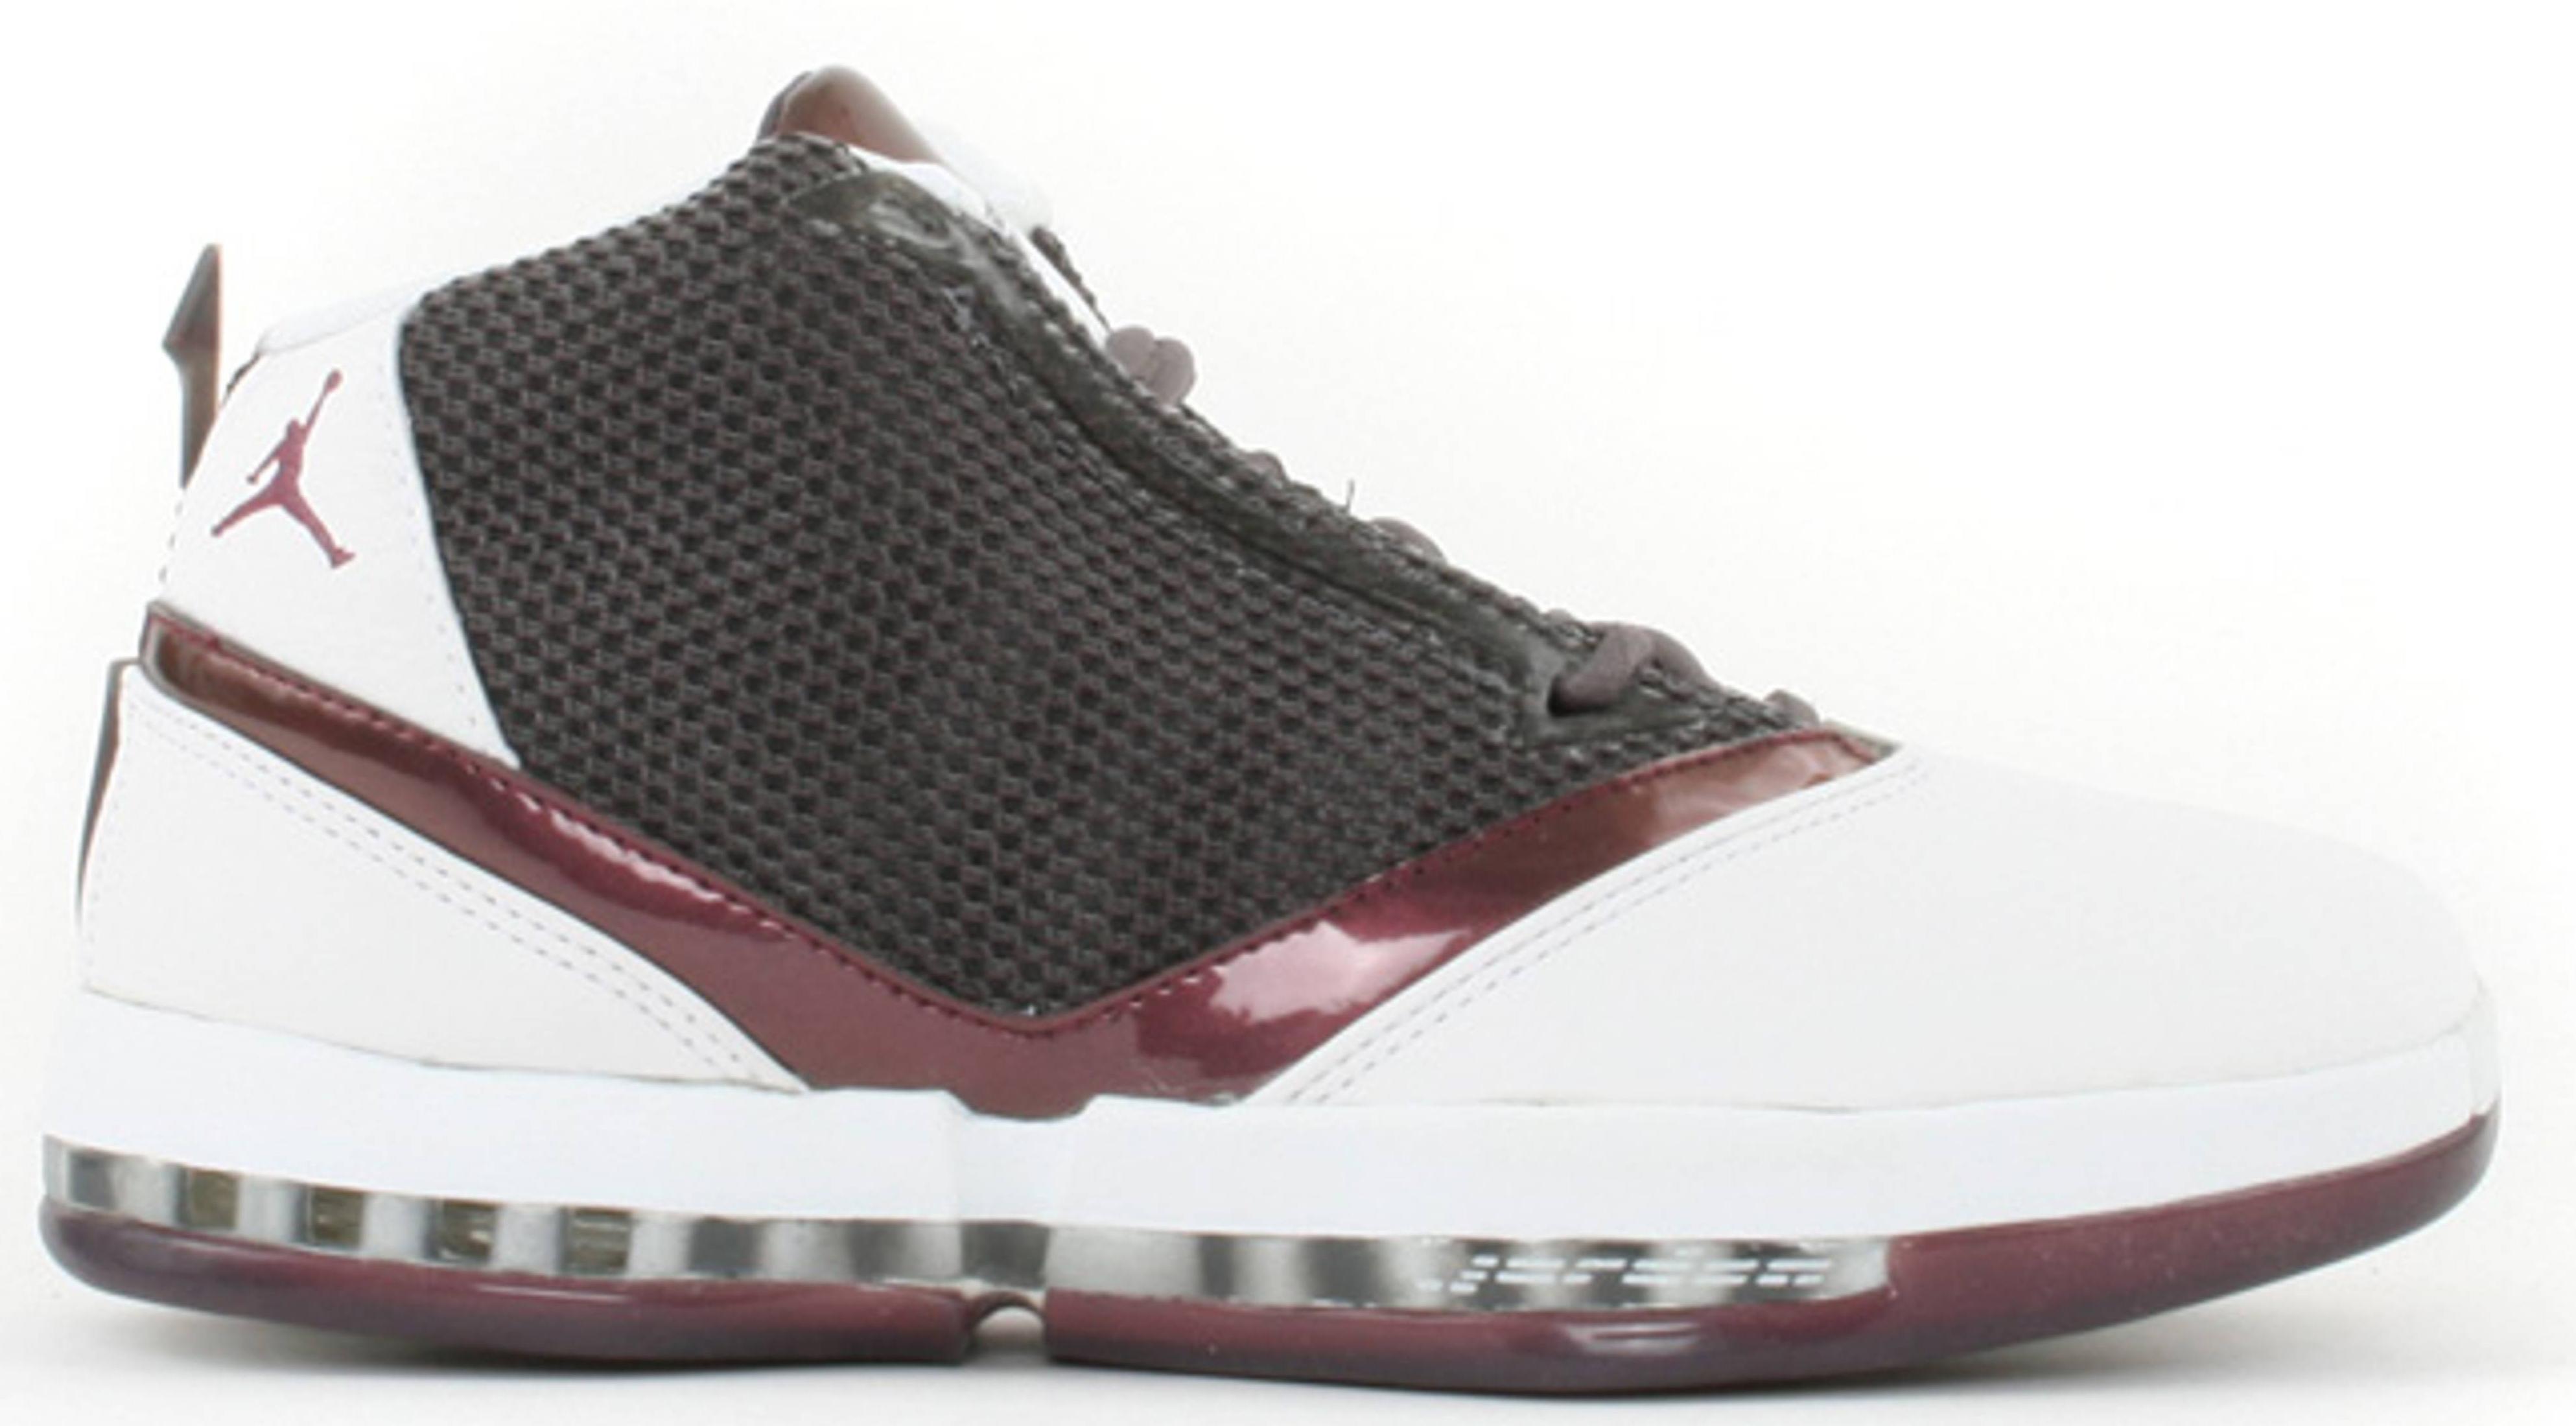 entrega rápida barato auténtico Comprar Air Jordan 16 Zapatos aaa descuento kwt1prr